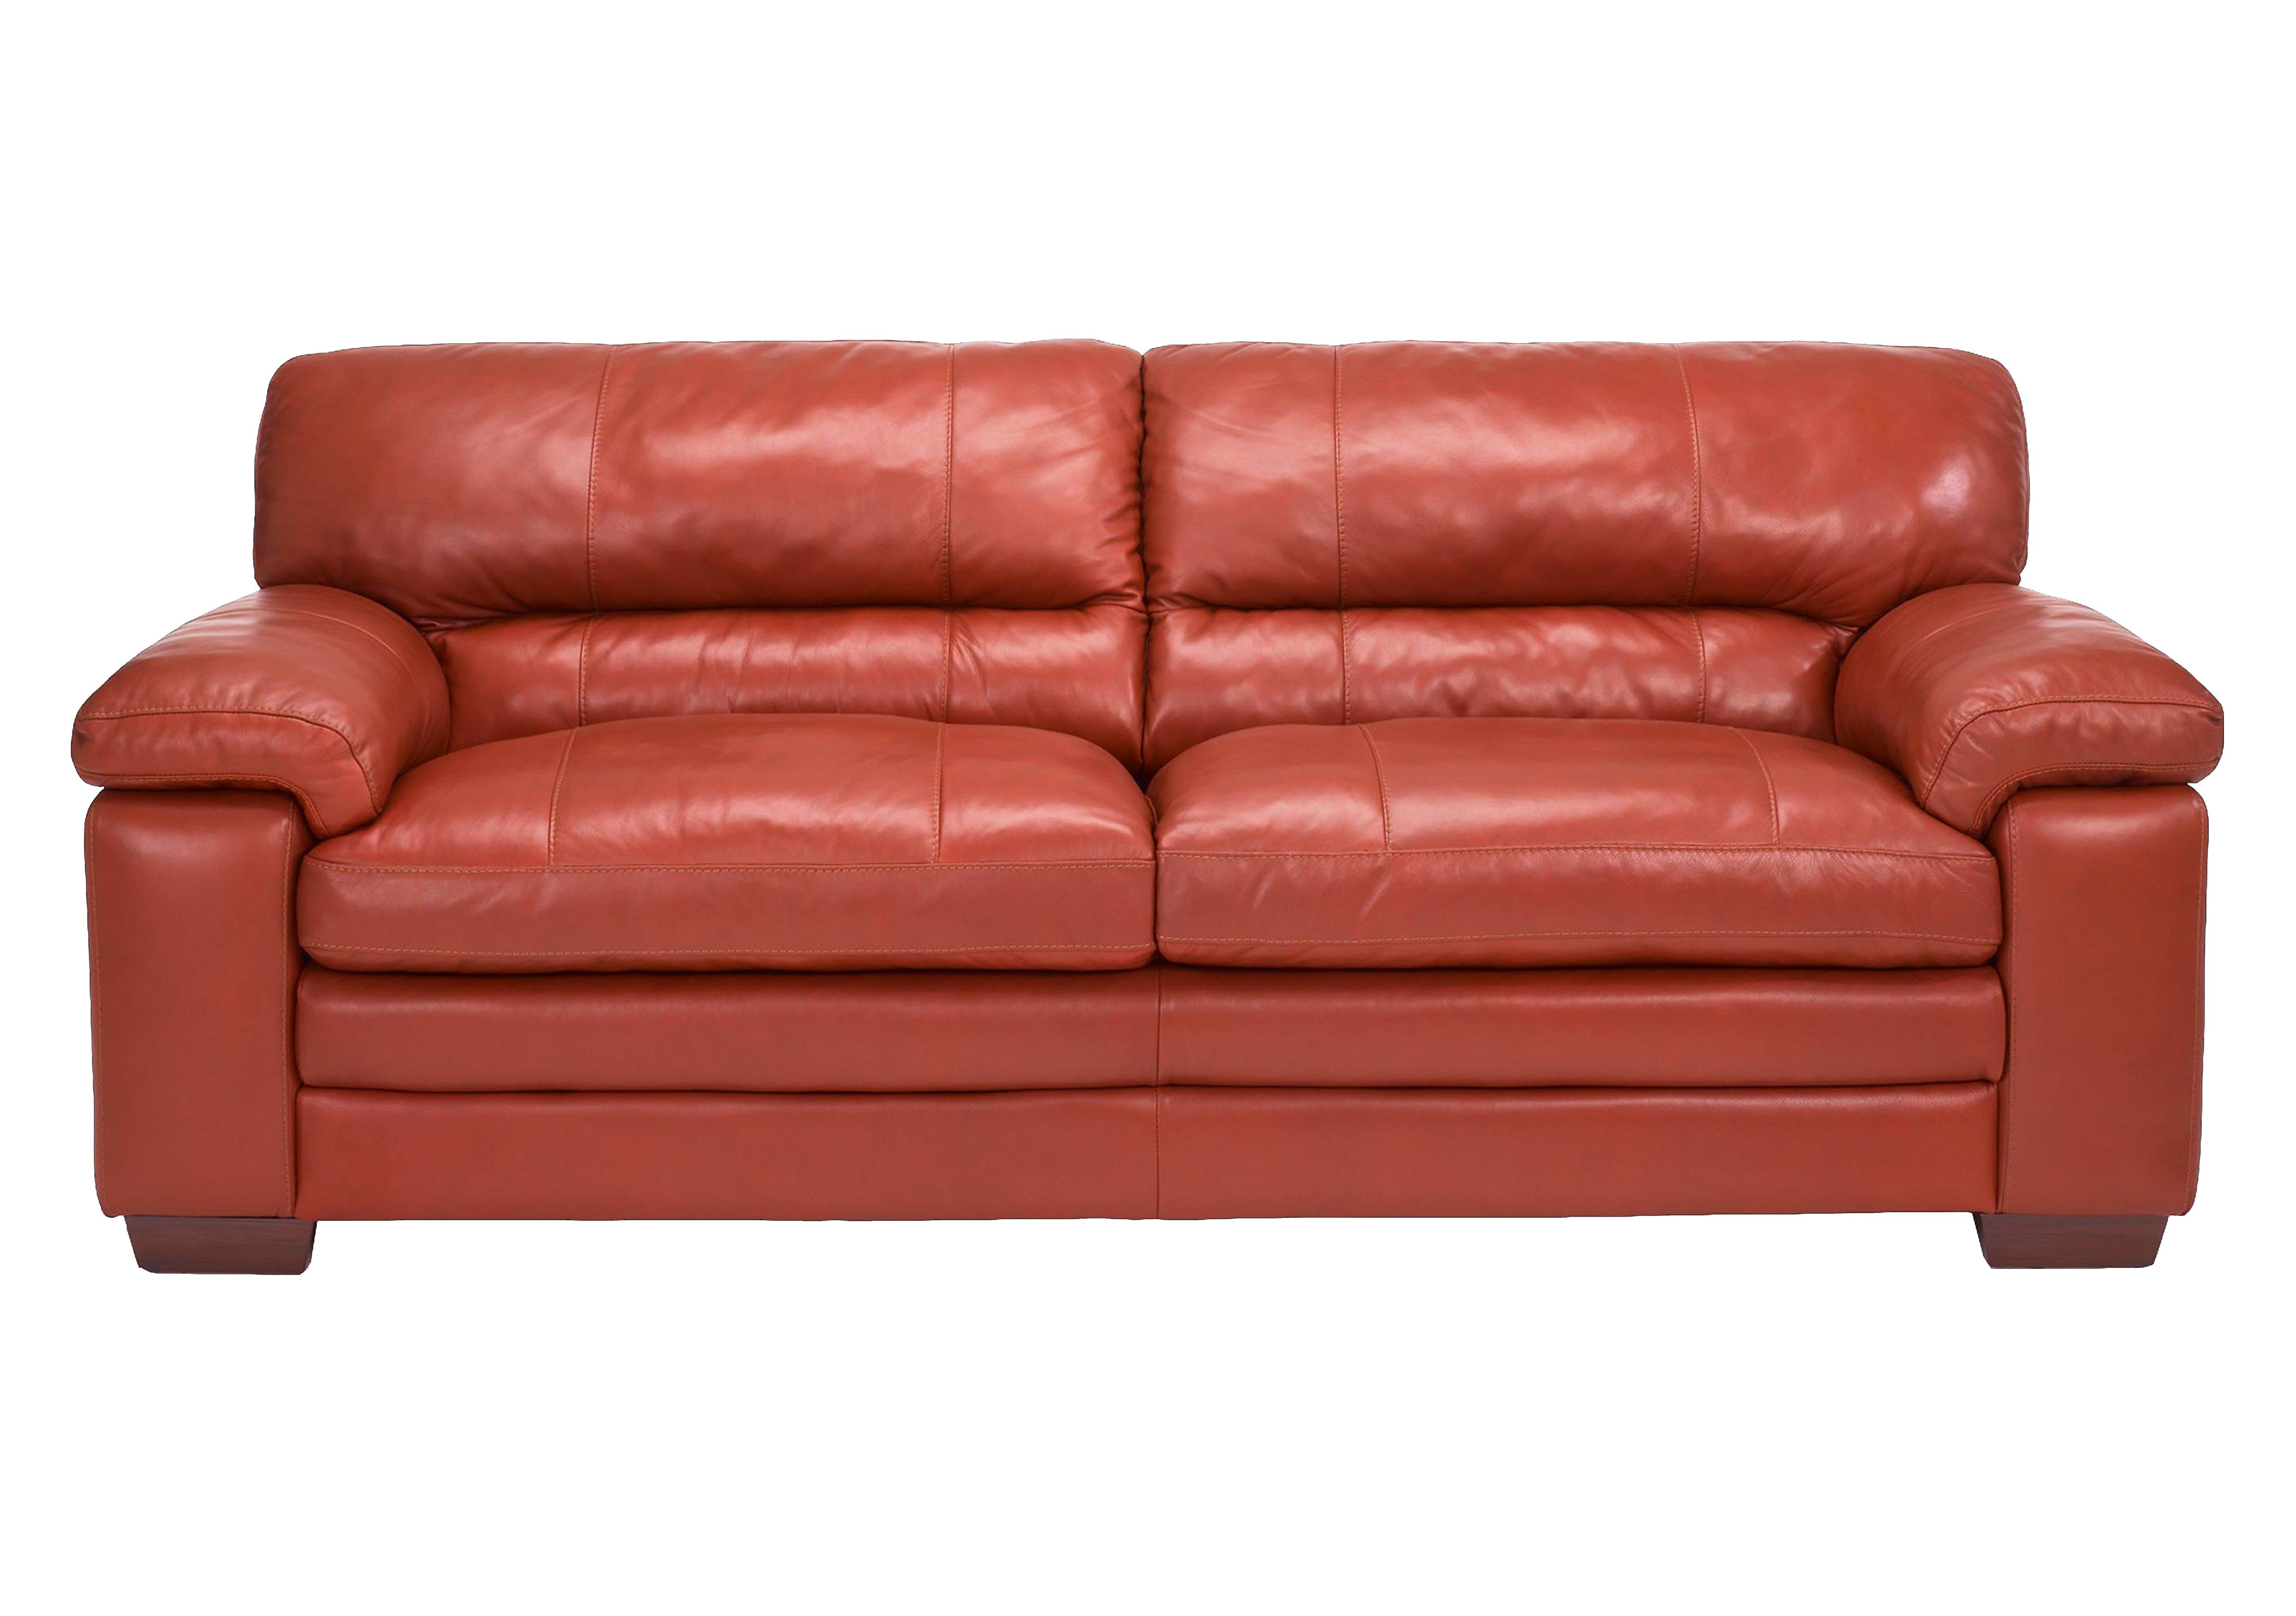 Carolina 3 Seater Leather Sofa World of Leather Furniture Village